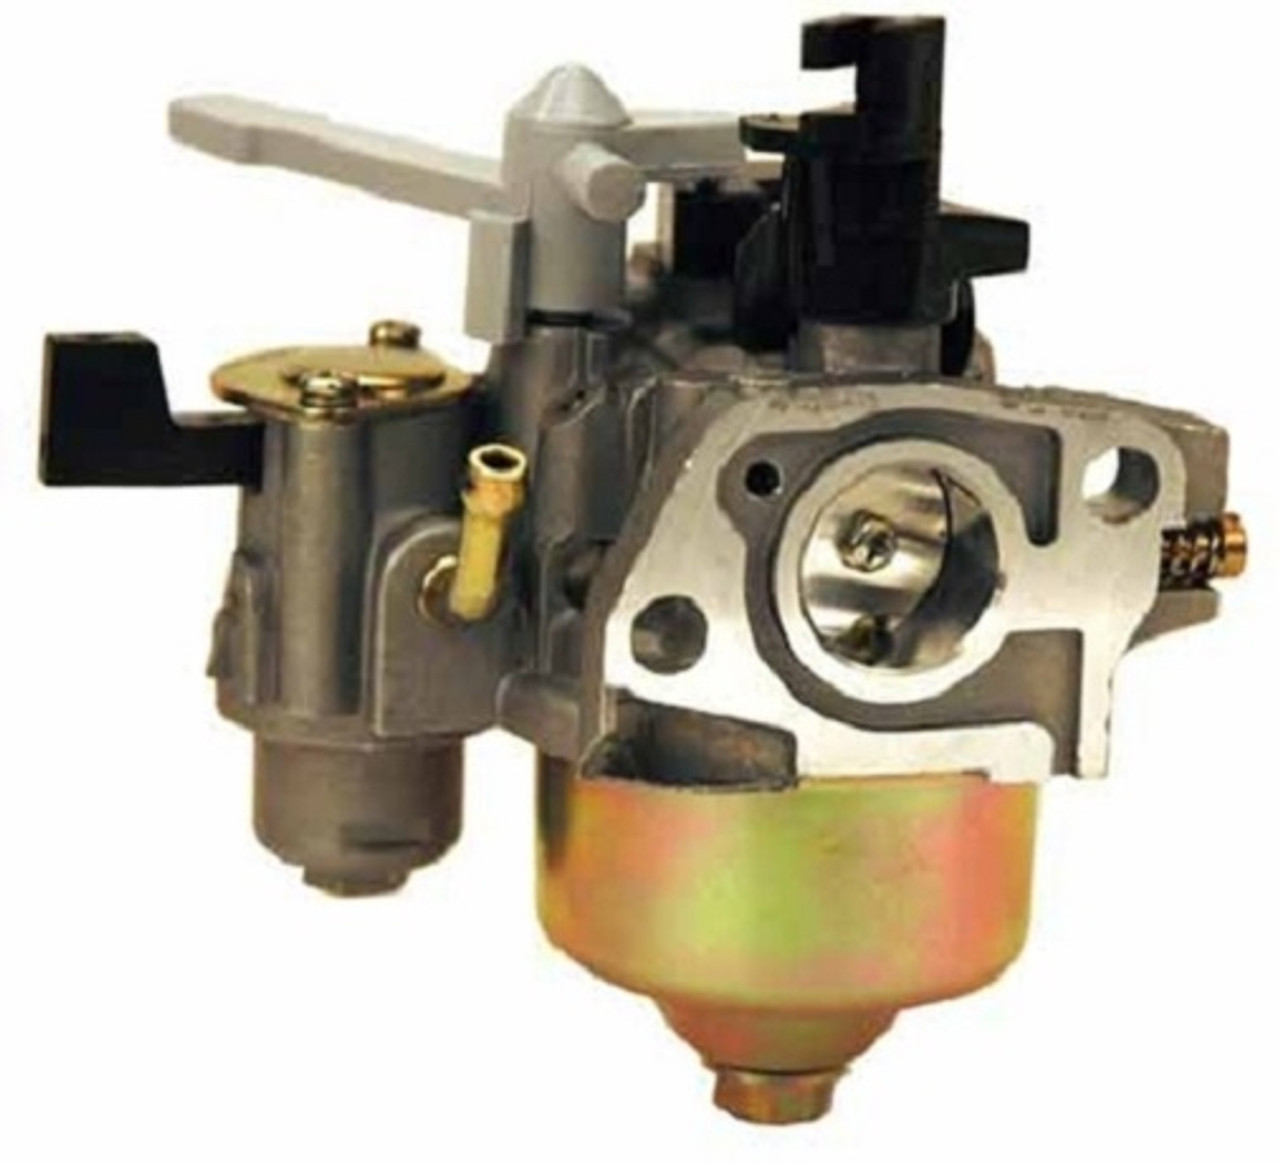 TRJ Twister Series Stock Appearing Race Carburetor